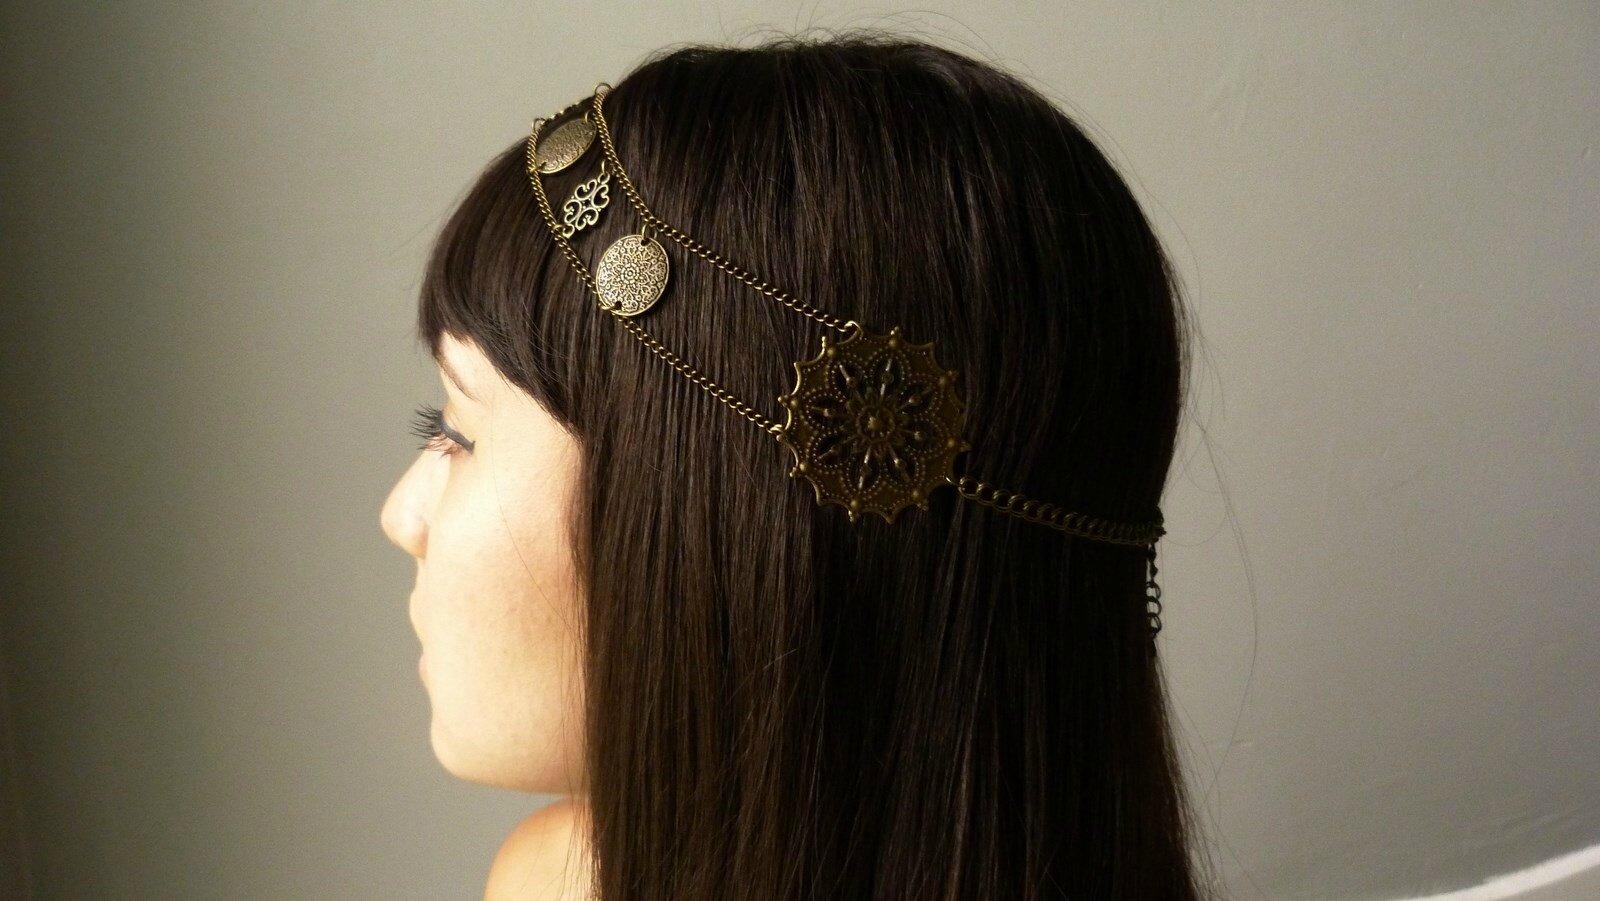 headband cléopatre (5) [1600x1200]